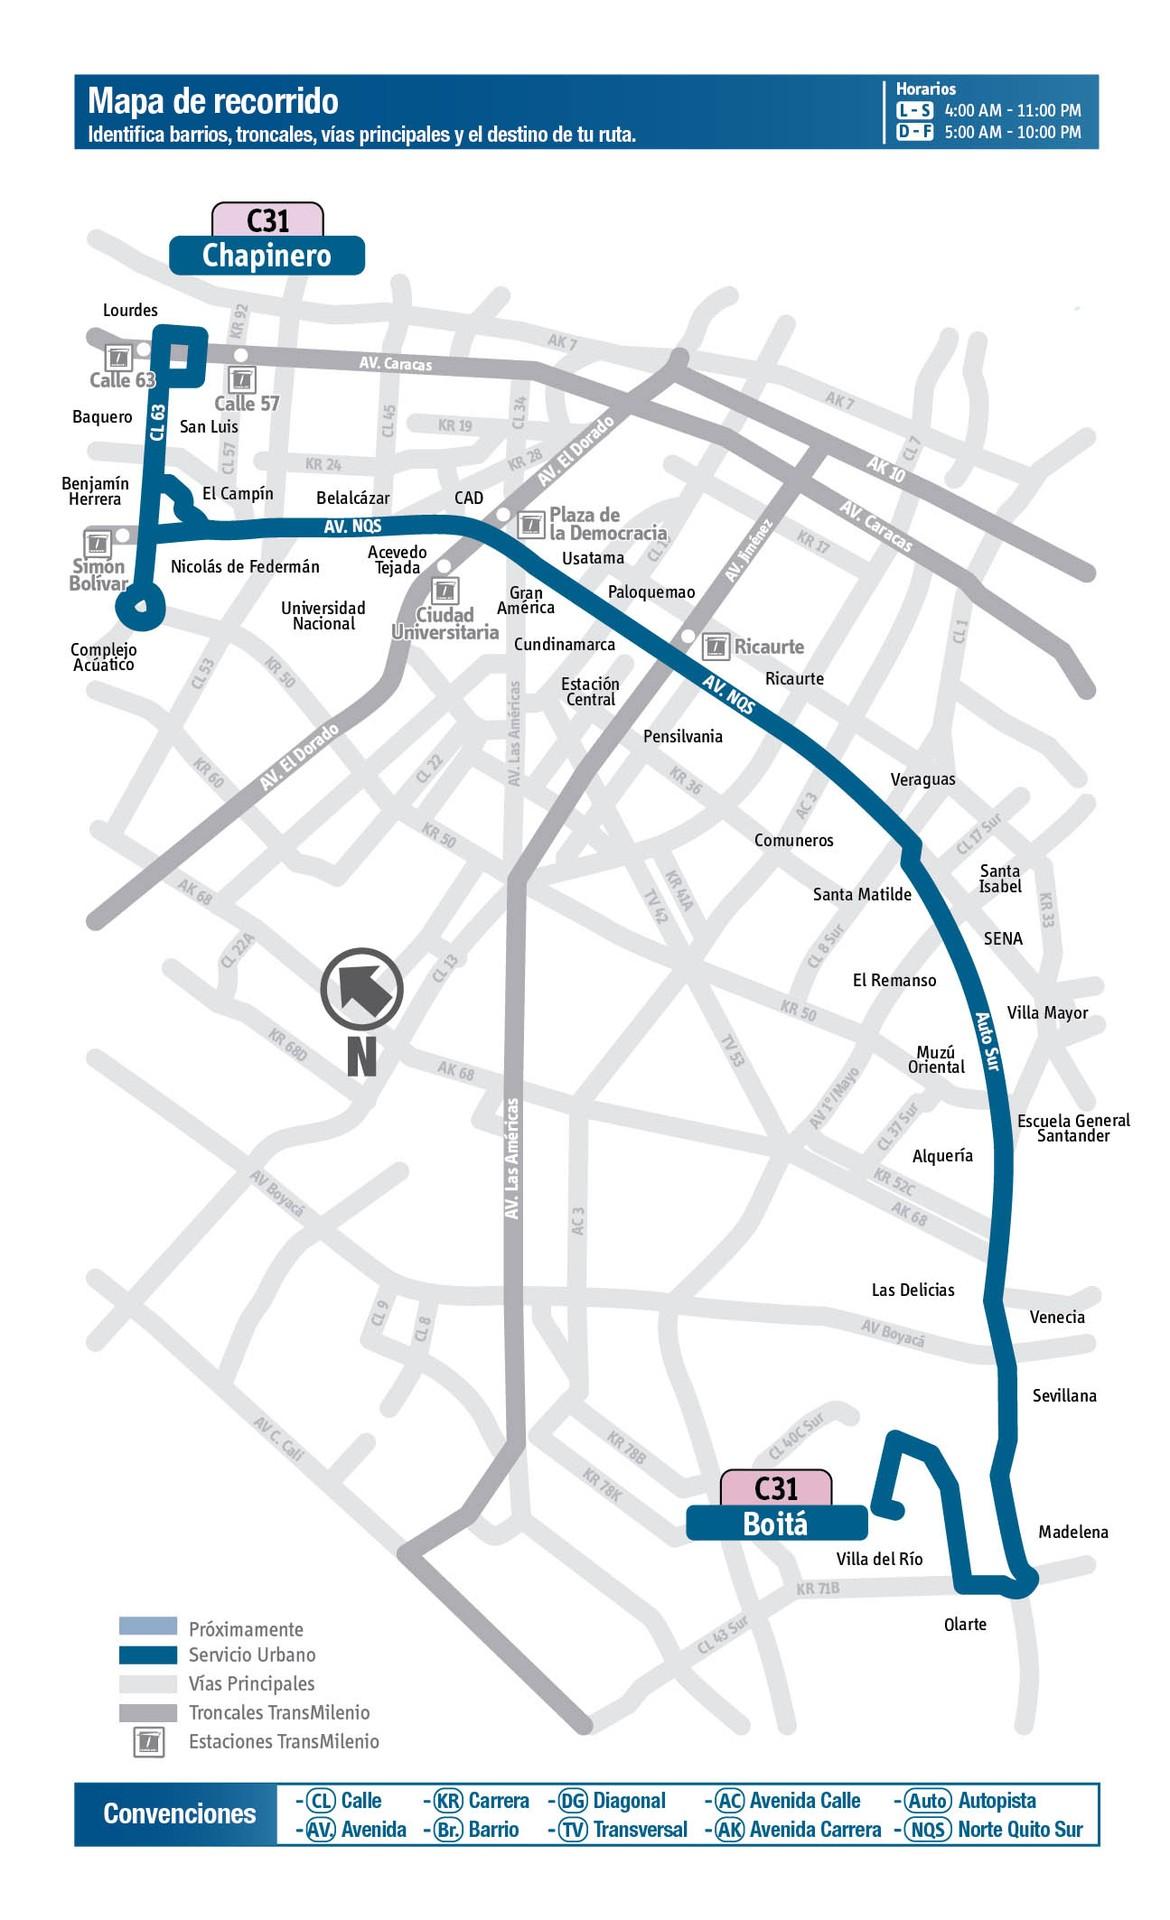 Ruta SITP: C31 Chapinero ↔ Boitá [Urbana] 2